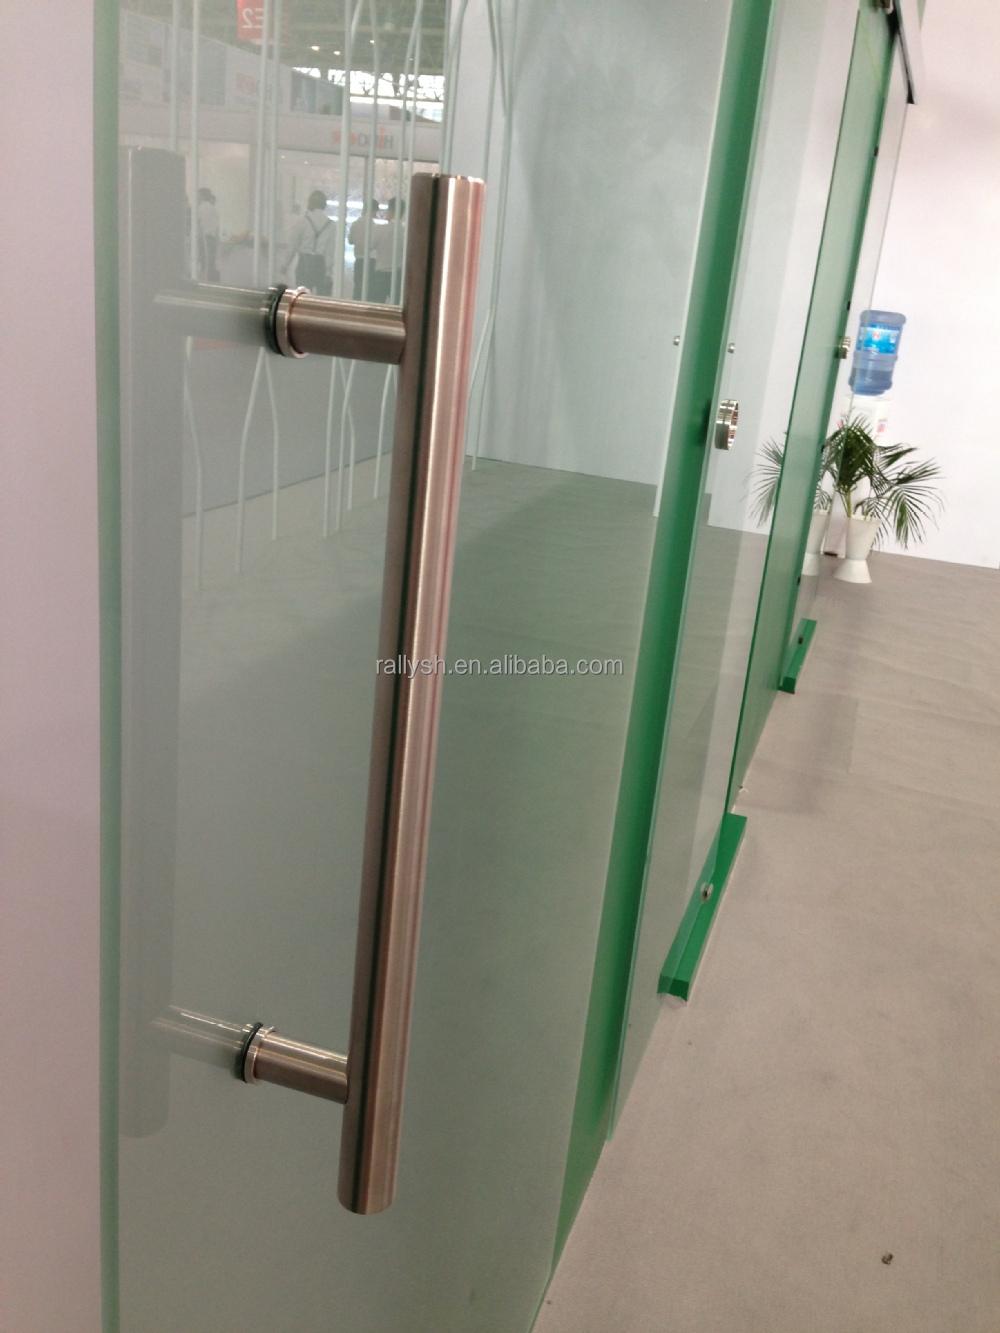 Sliding door plexiglass barn style door for glass door interior sliding door plexiglass barn style door for glass door interiorexterior eventelaan Choice Image